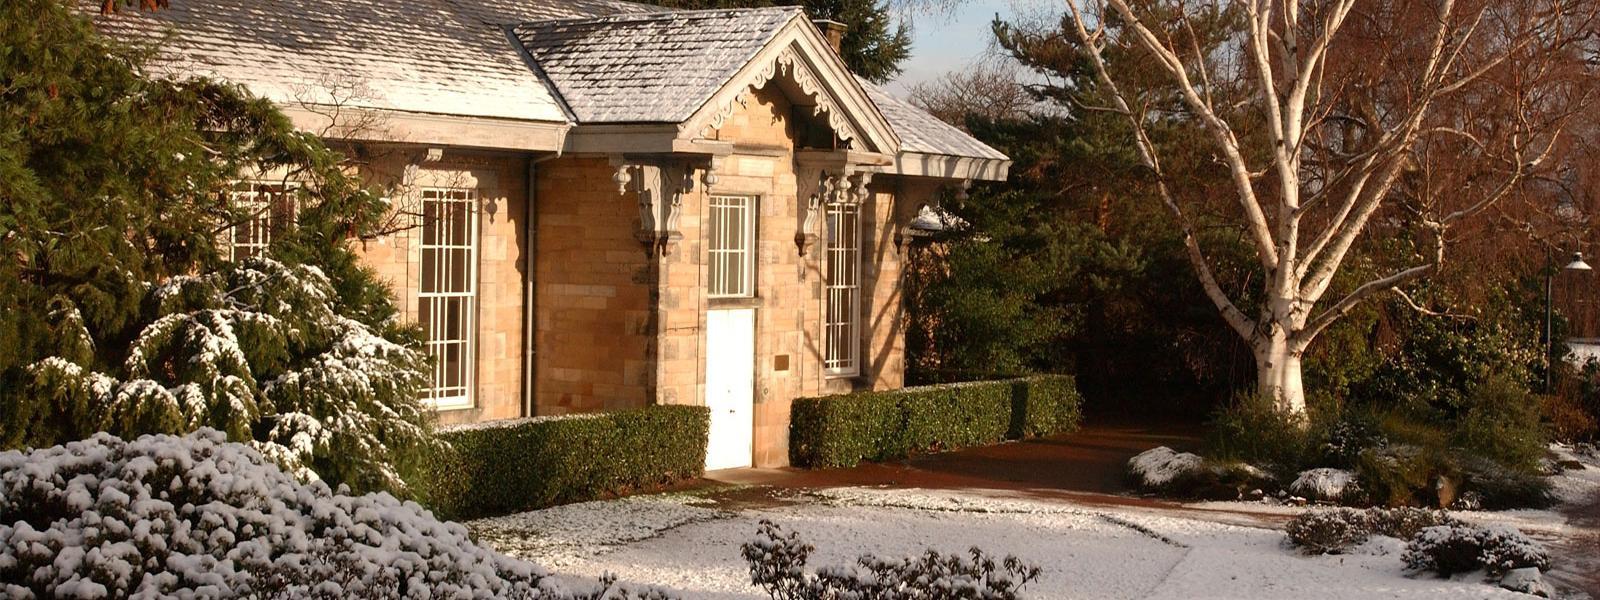 Royal Botanic Garden Edinburgh unveils winter wedding offer